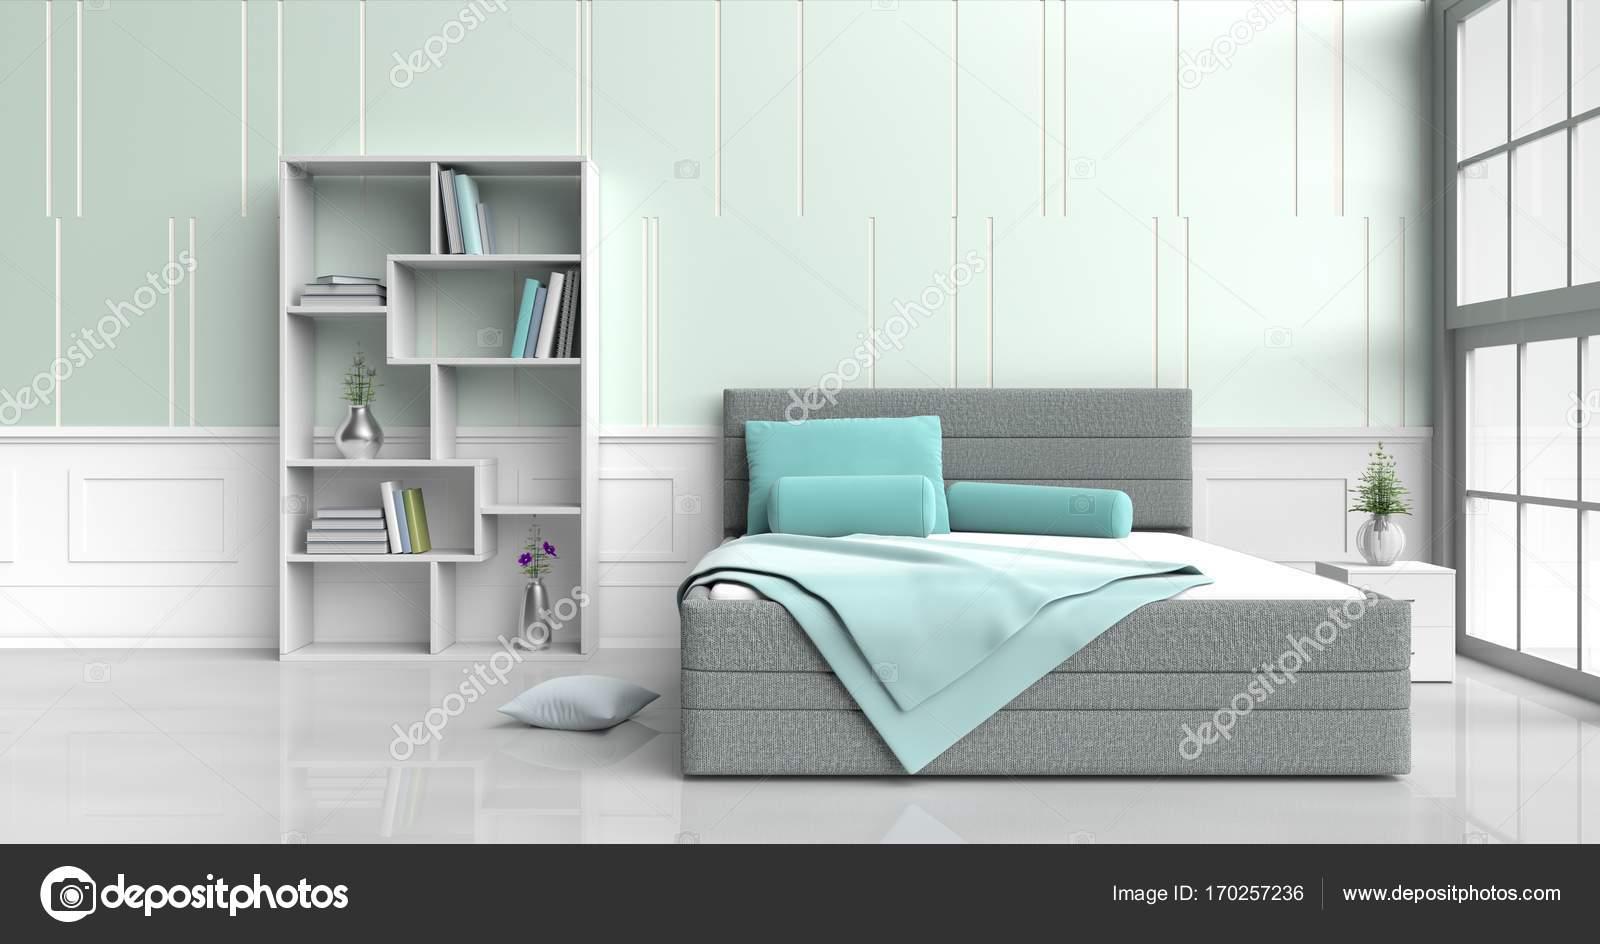 https://st3.depositphotos.com/12406876/17025/i/1600/depositphotos_170257236-stock-photo-white-green-bed-room-decorated.jpg